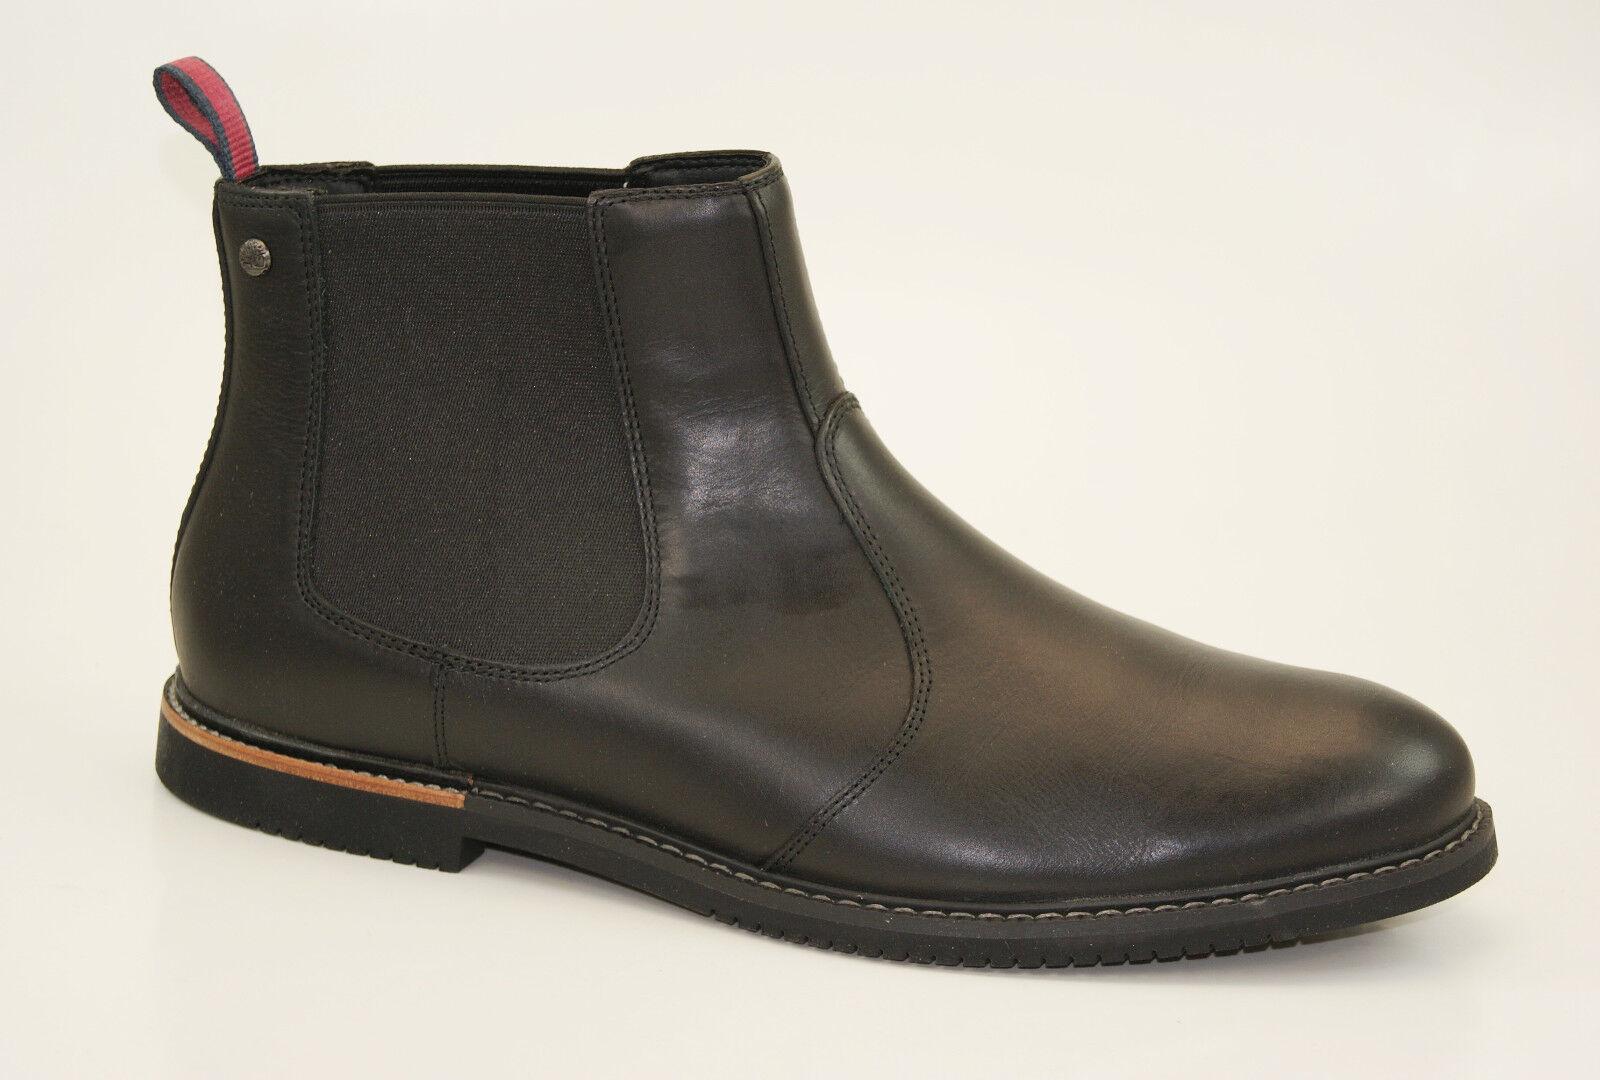 Timberland Brook Park Chelsea Stiefel Stiefeletten Herren Schuhe Stiefel 5517A    | Outlet Store Online